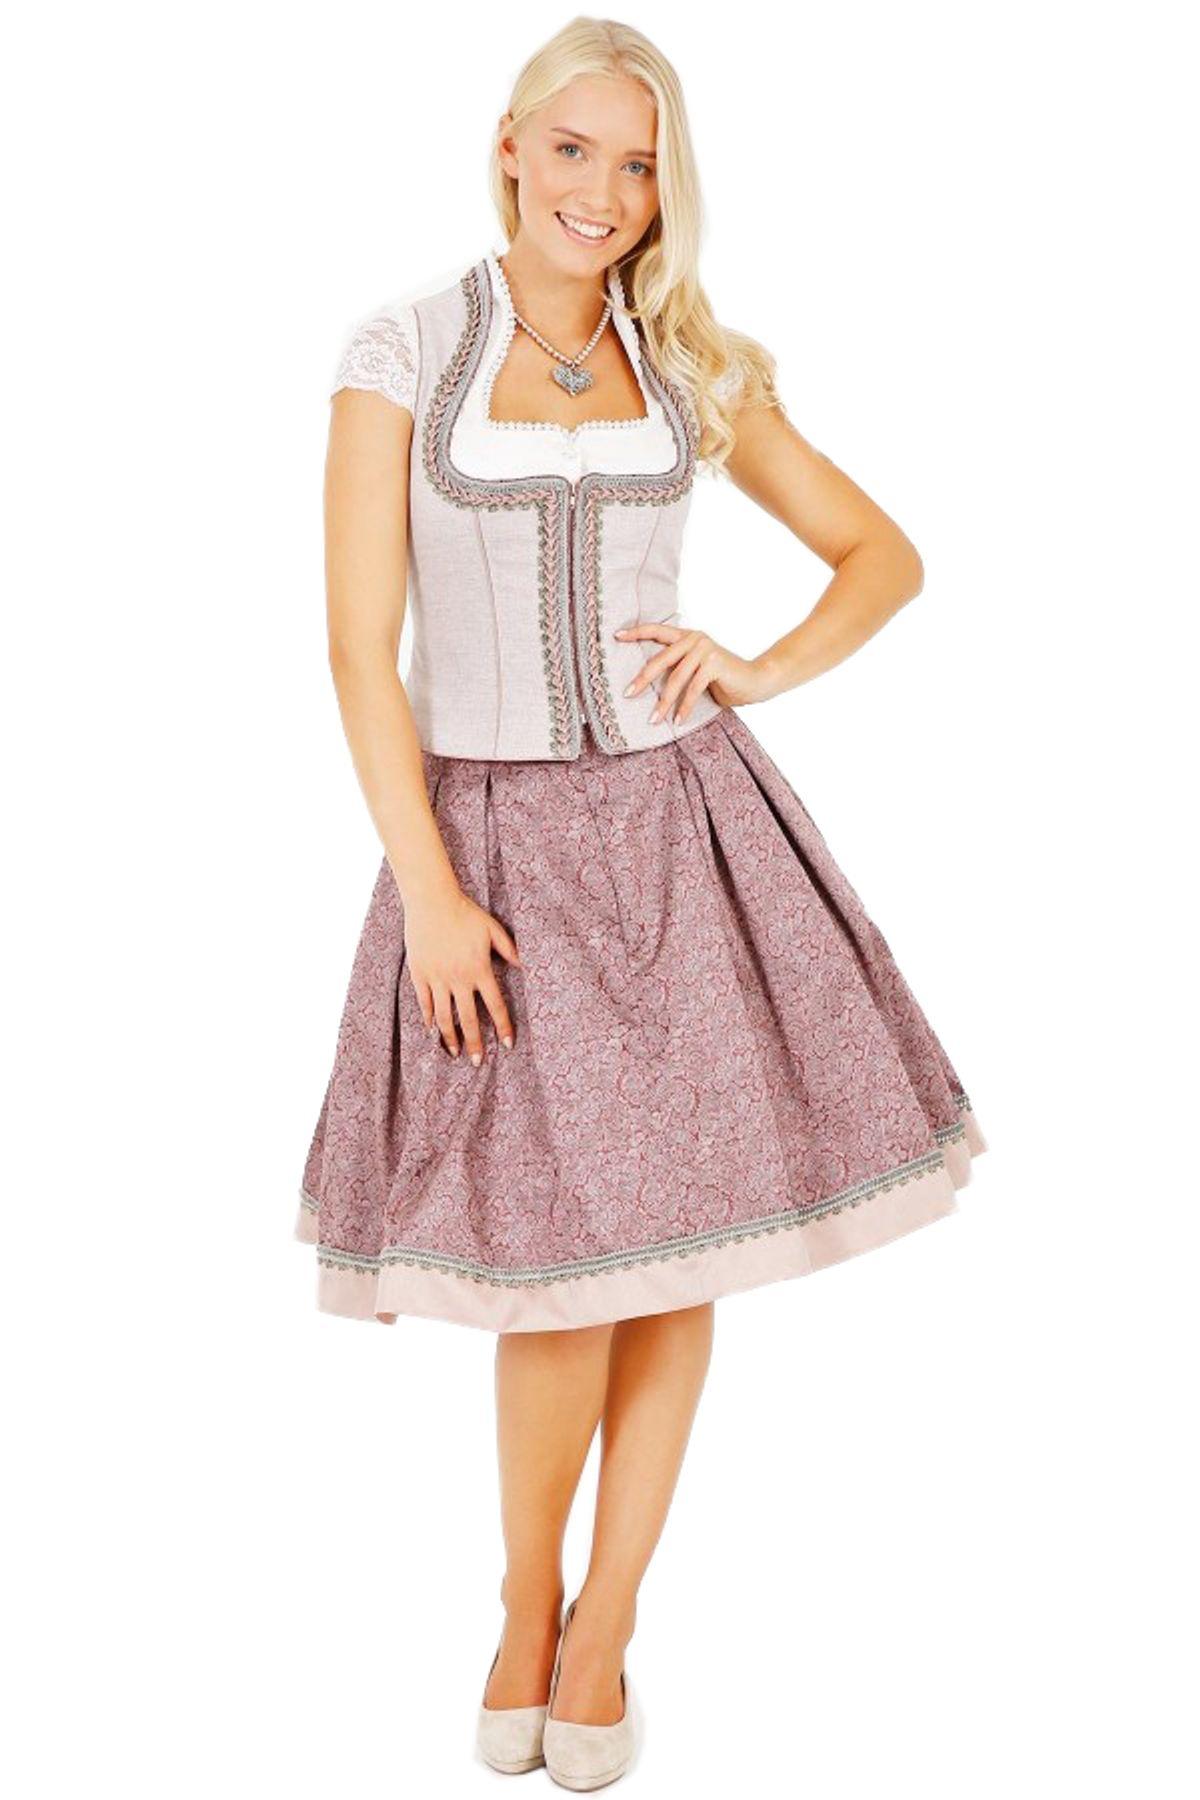 Krüger - Damen Trachtenrock in rosa,  Mary (25670-33) – Bild 1